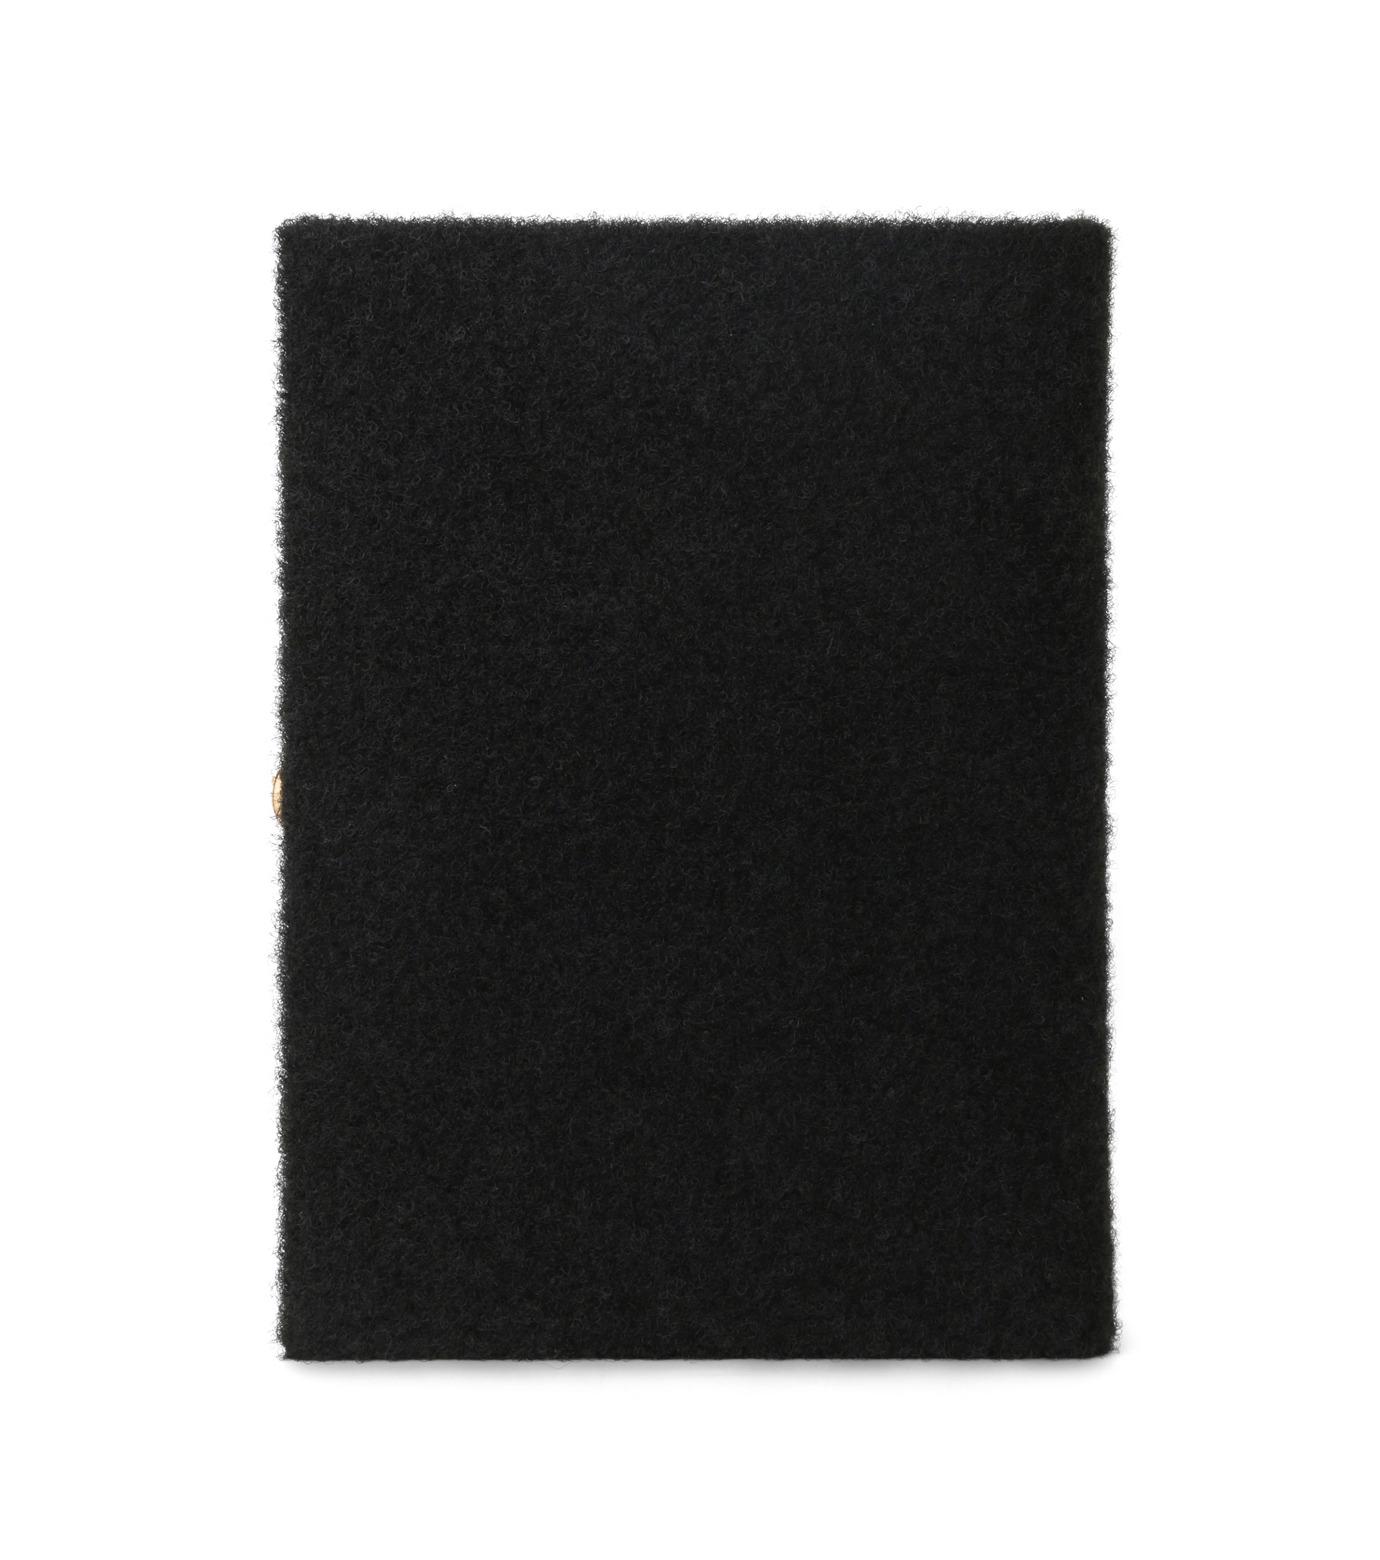 Olympia Le-Tan(オリンピア ルタン)のBook Clutch Velcro-BLACK(クラッチバッグ/clutch bag)-FW16BBC024-13 拡大詳細画像3